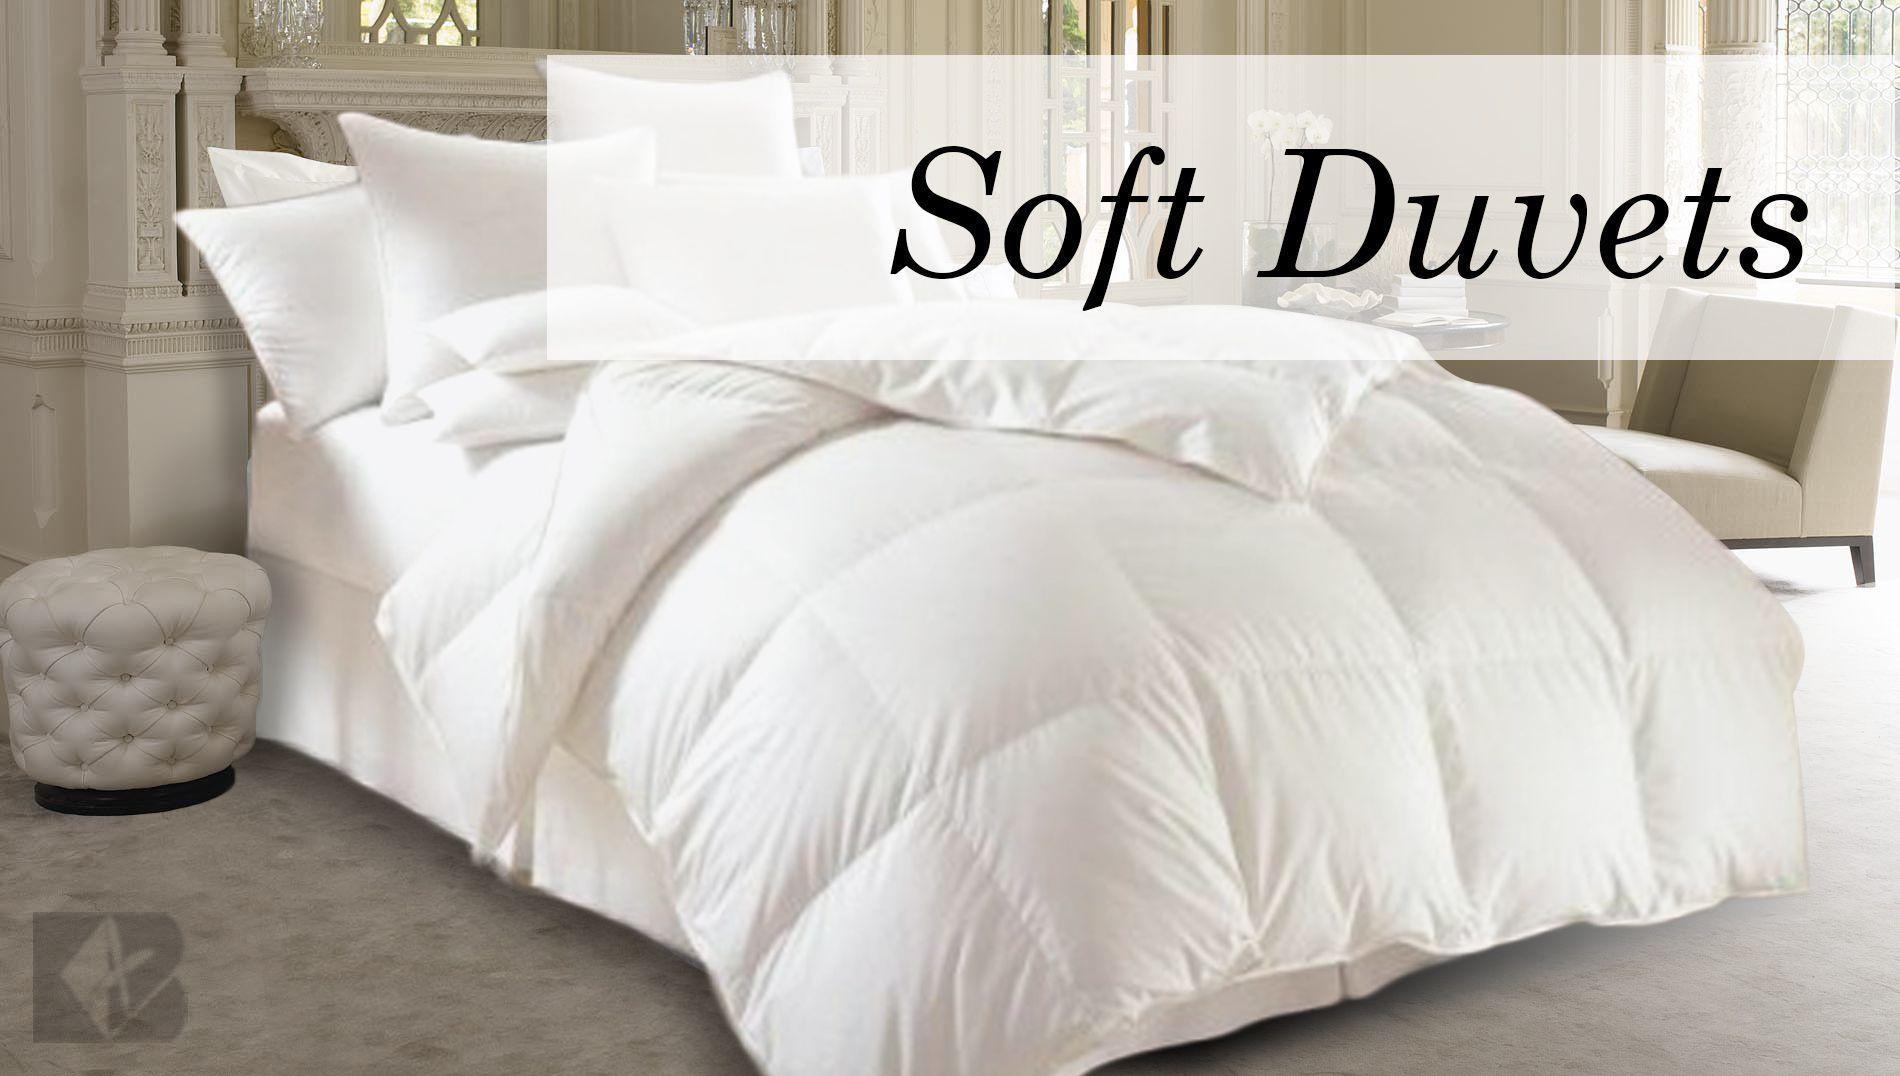 Springfit Platinum Duvet Enjoy Your Sleep With Our Super Soft Duvets Https